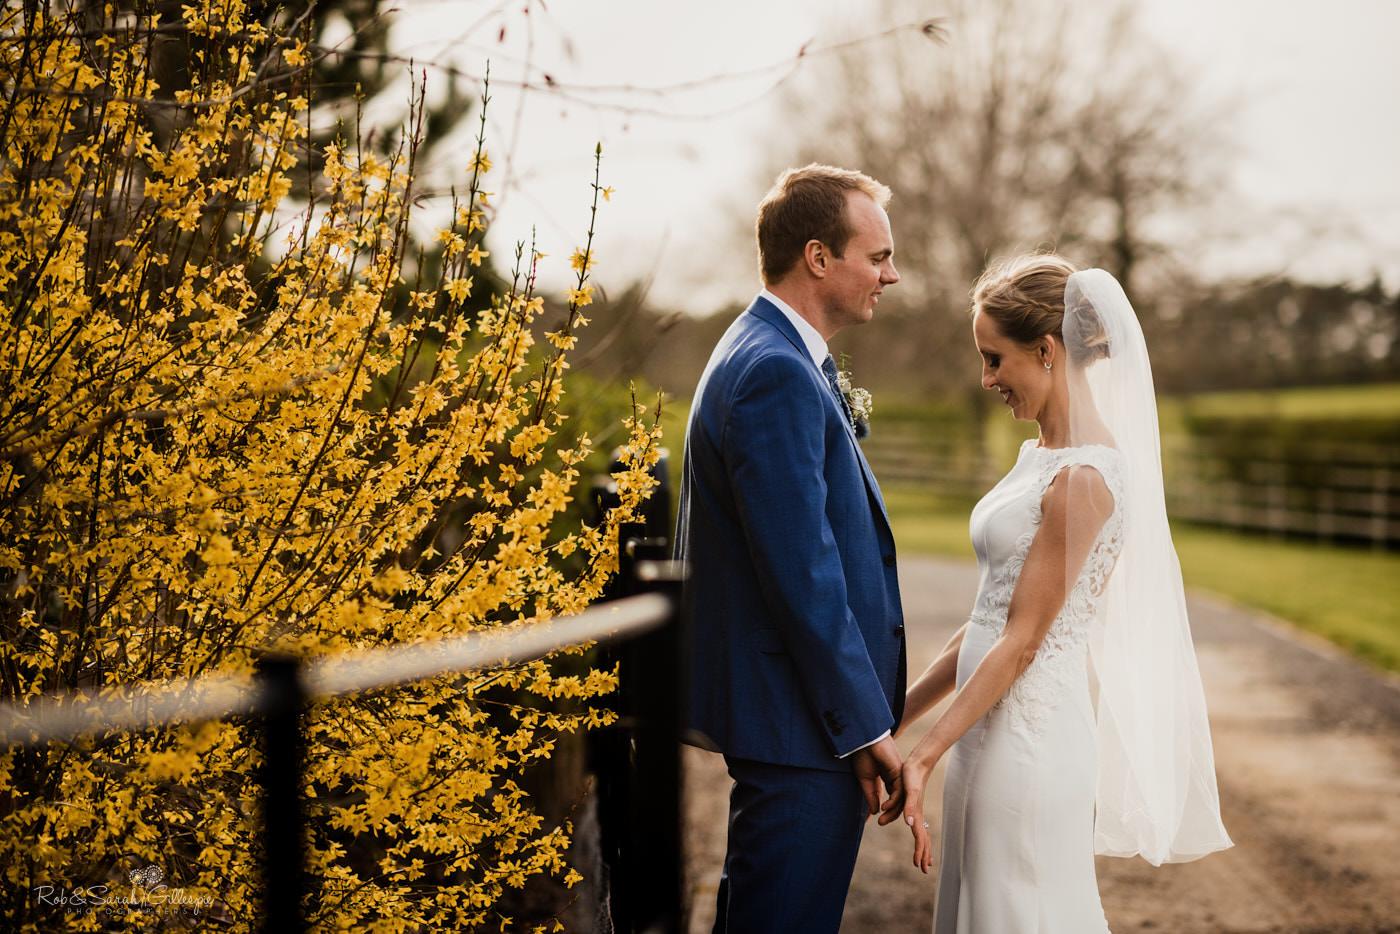 Wedding photography at Swallows Nest Barn